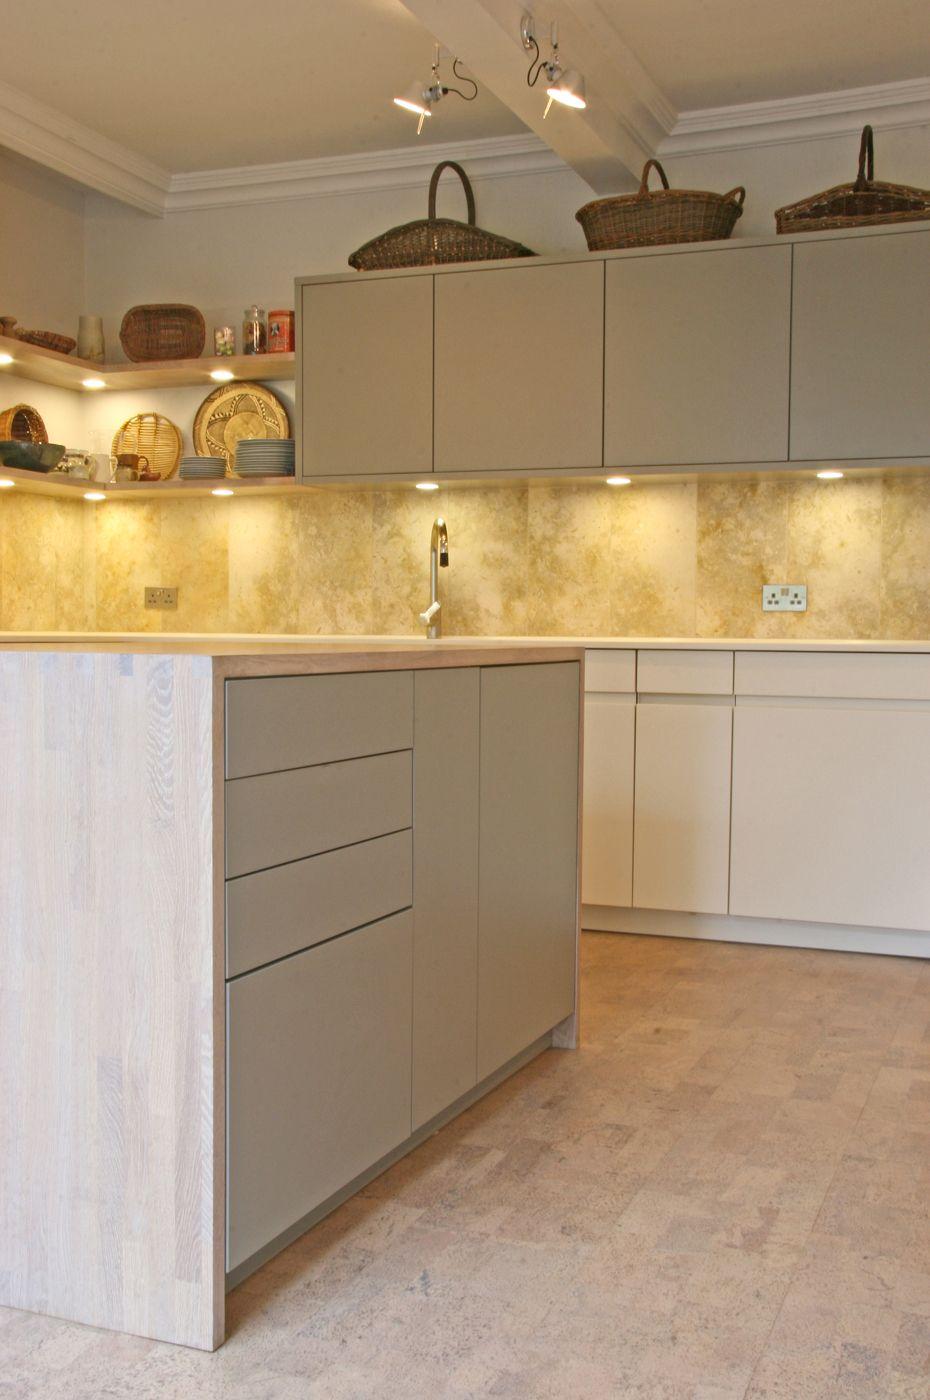 best options for kitchen flooring flooring for kitchen Kitchen Cork flooring